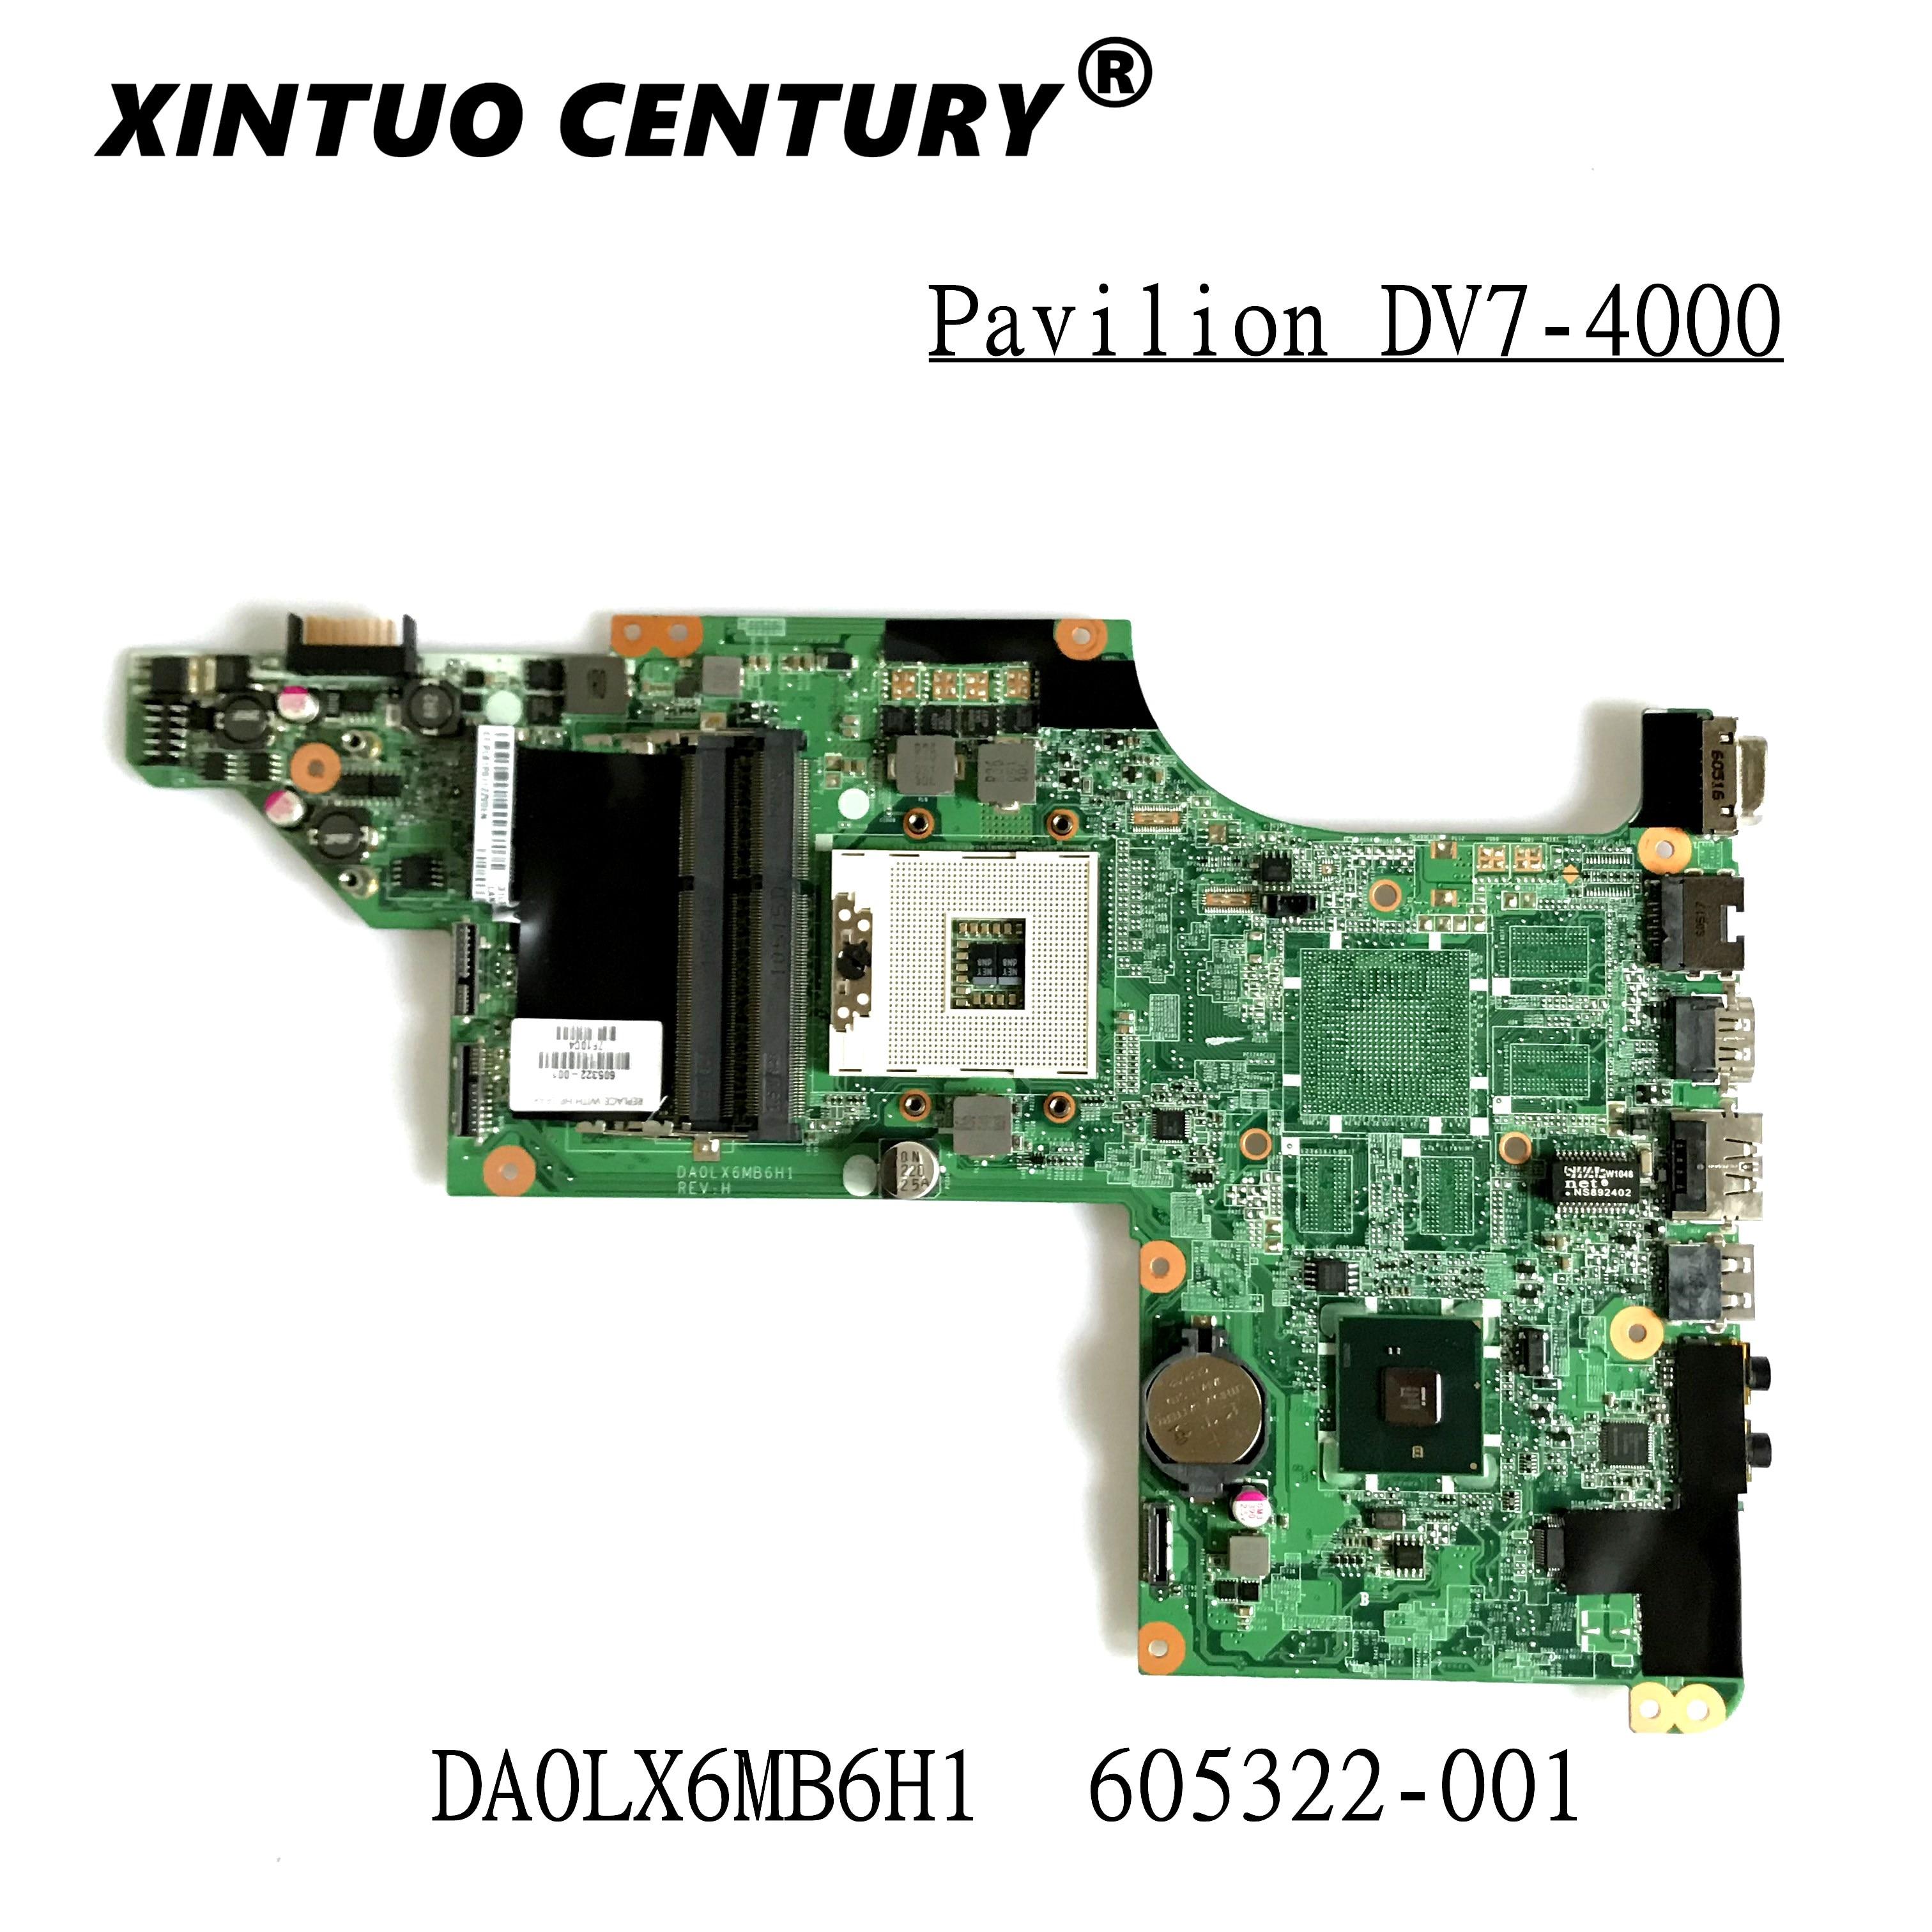 605322-001 para HP PAVILION DV7T-4100 NOTEBOOK HP ordenador portátil placa base DV7-4000...